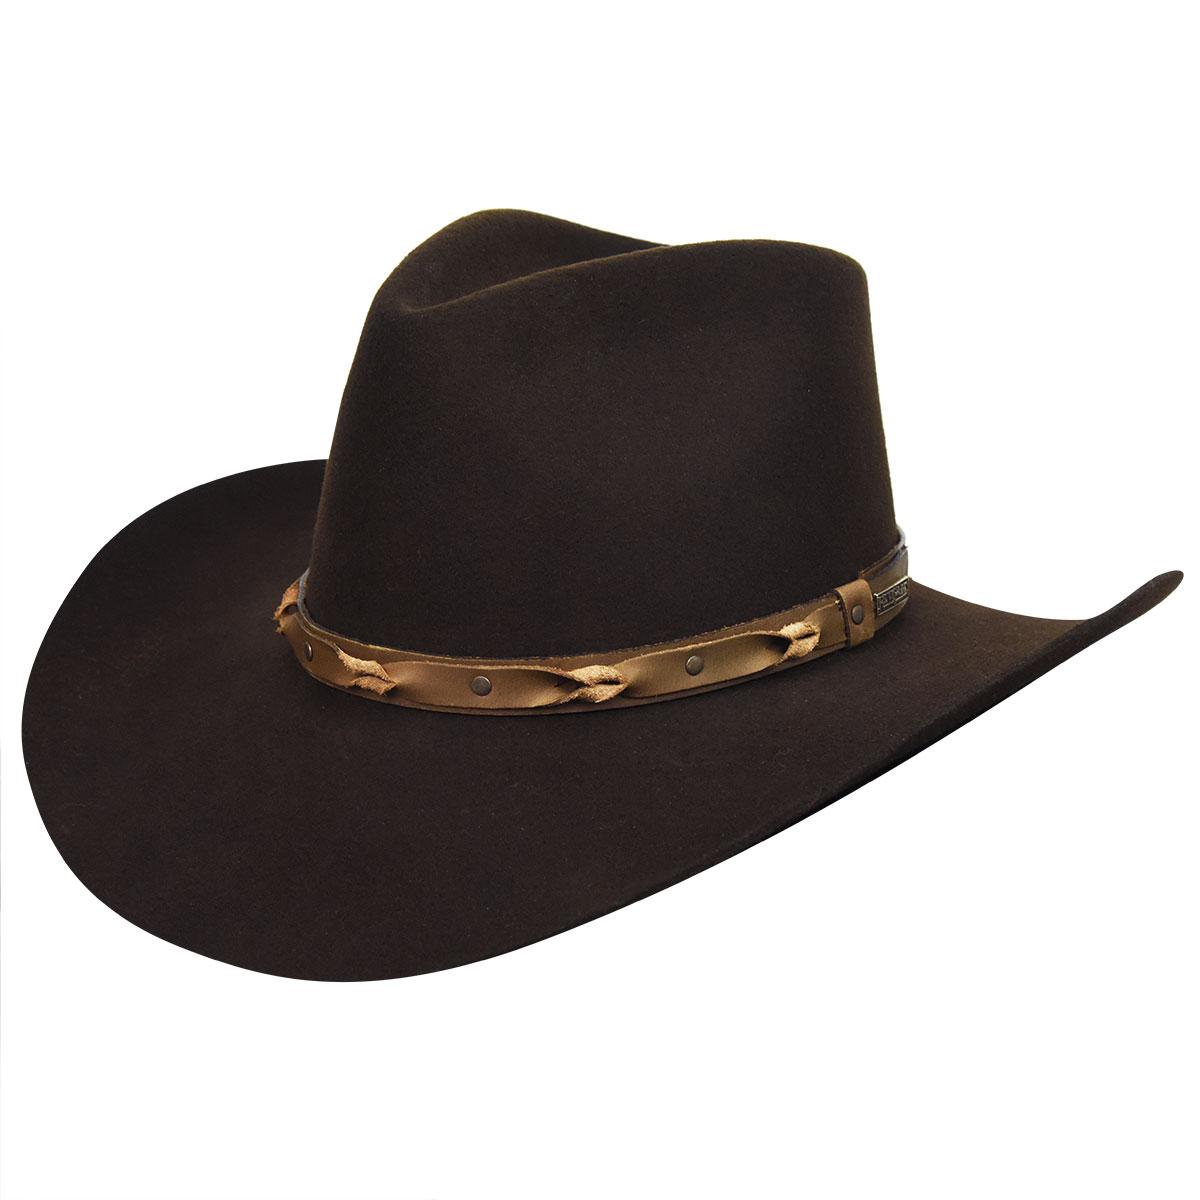 Bailey Western Navarro 2X Hat in Sudan